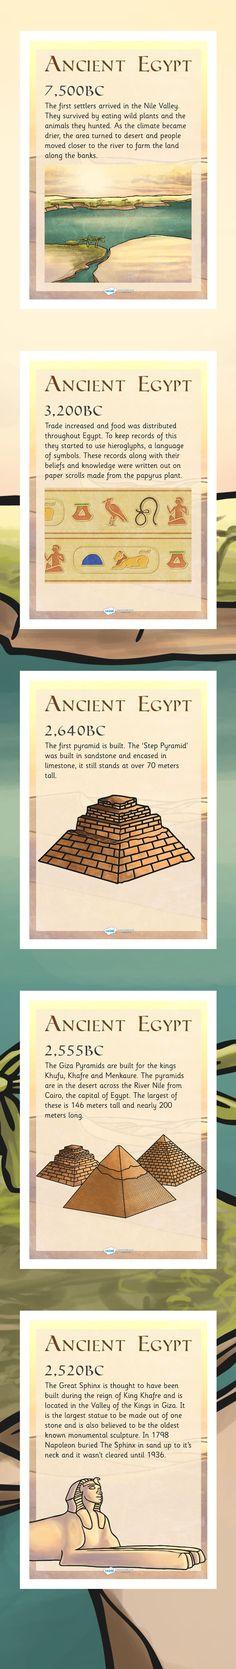 KS2 History Timelines- Ancient Egypt Timeline Posters